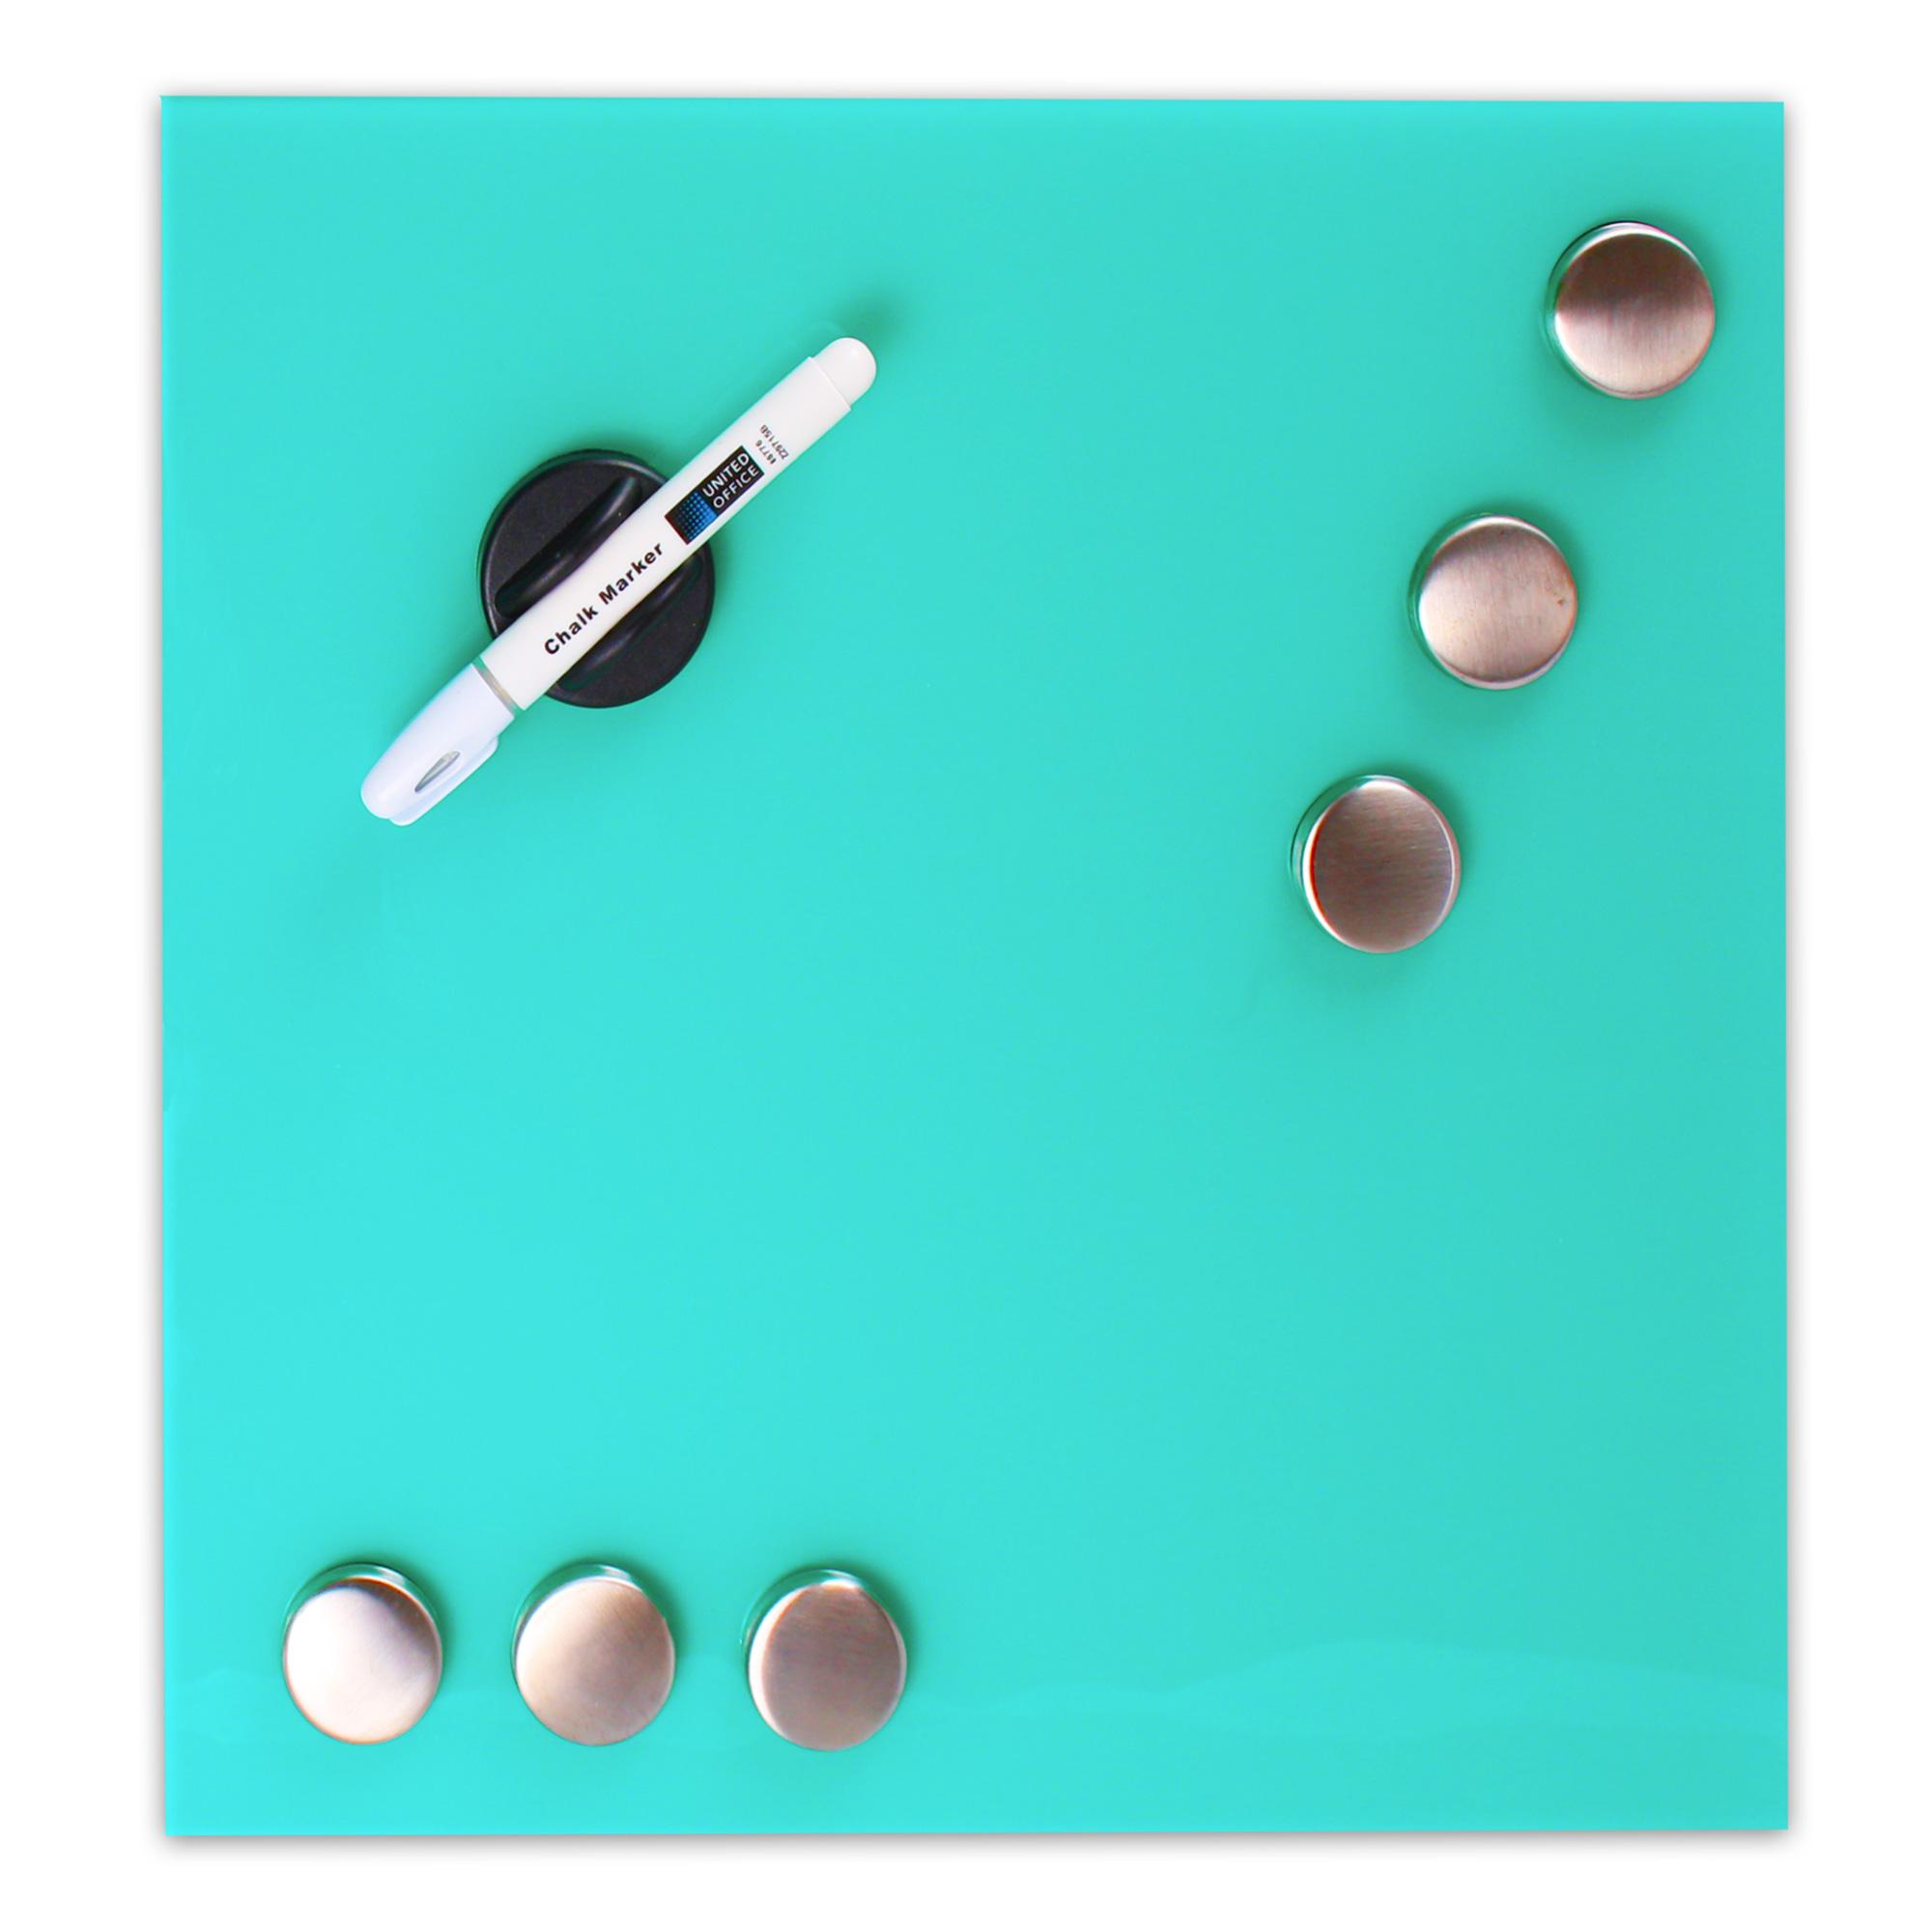 memoboard memo board whiteboard magnettafel magnet wand pinnwand anthrazit ebay. Black Bedroom Furniture Sets. Home Design Ideas